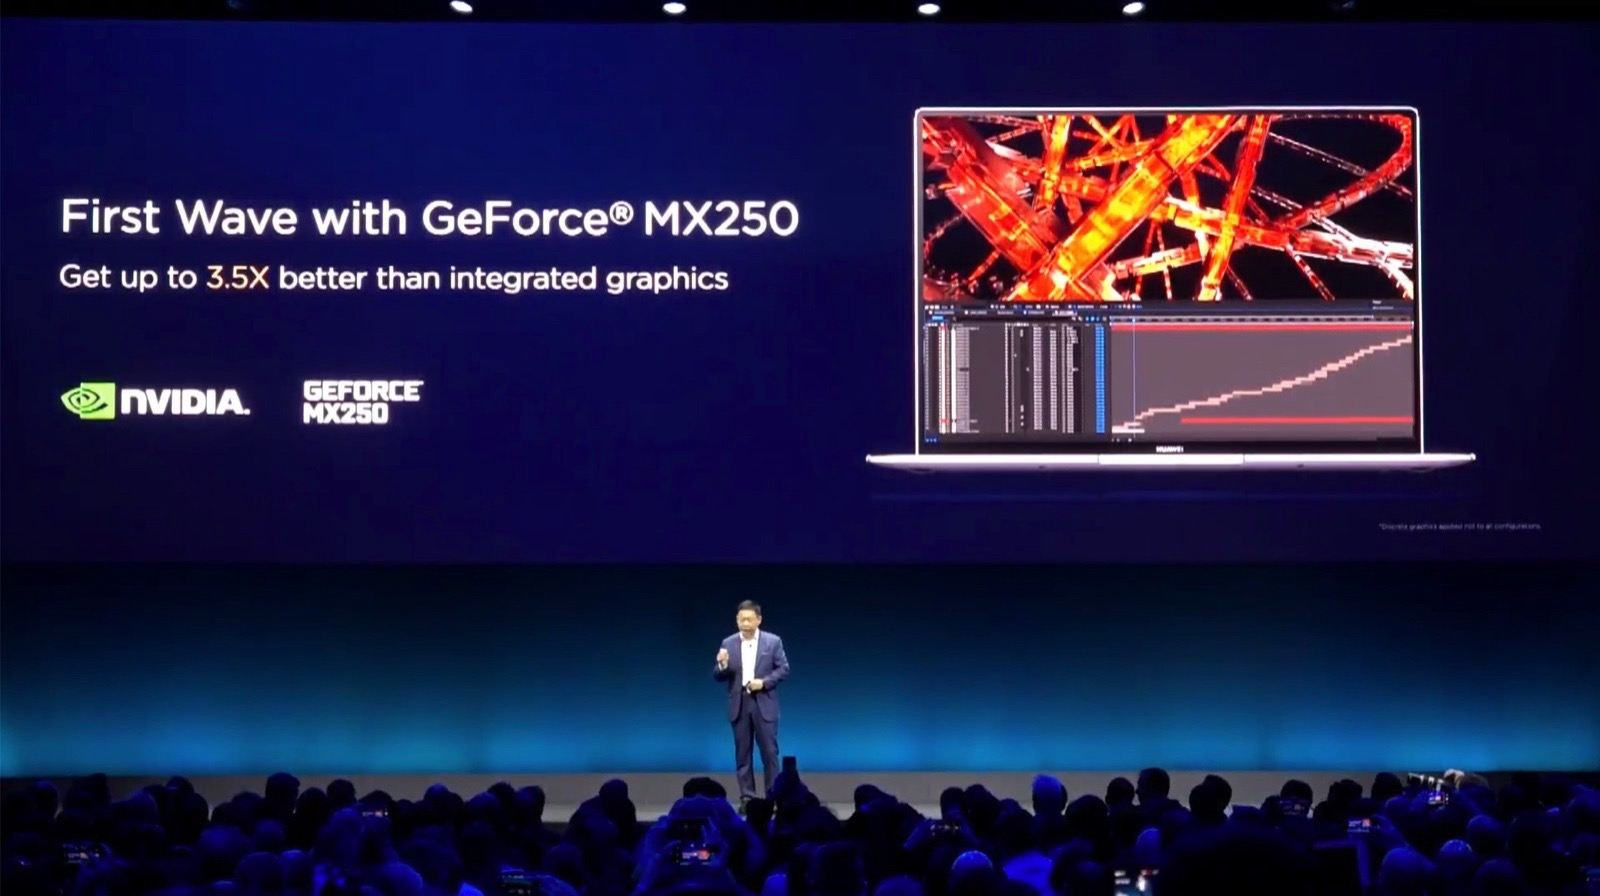 Huawei-MateBook-X-Pro-09.jpg